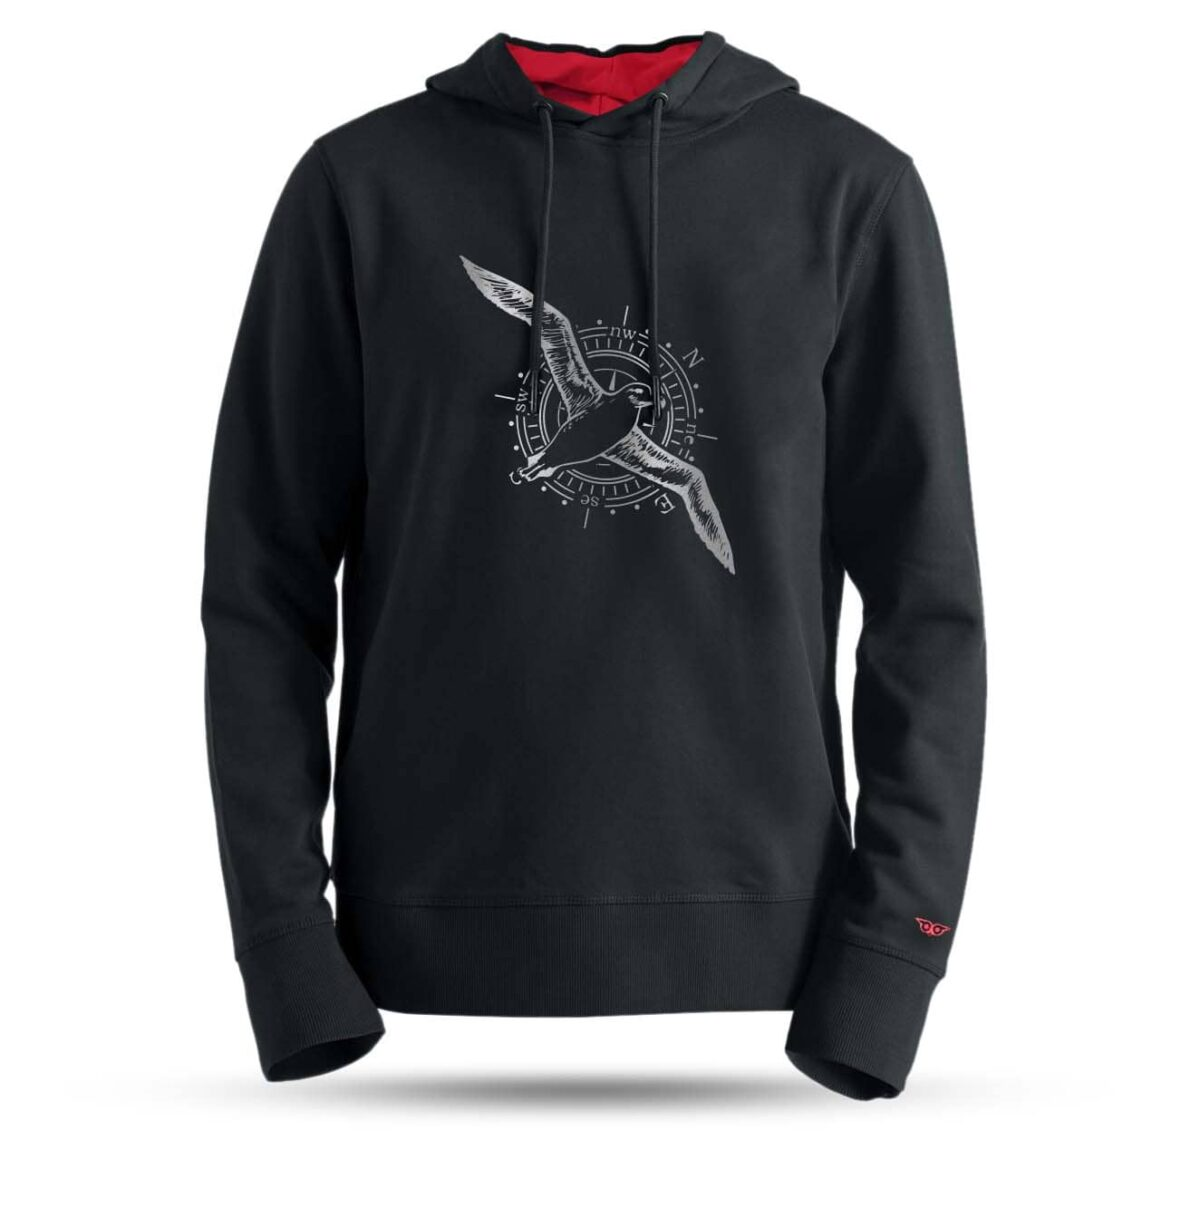 tarrzz-tasarim-kapsonlu-sweatshirt-albatros